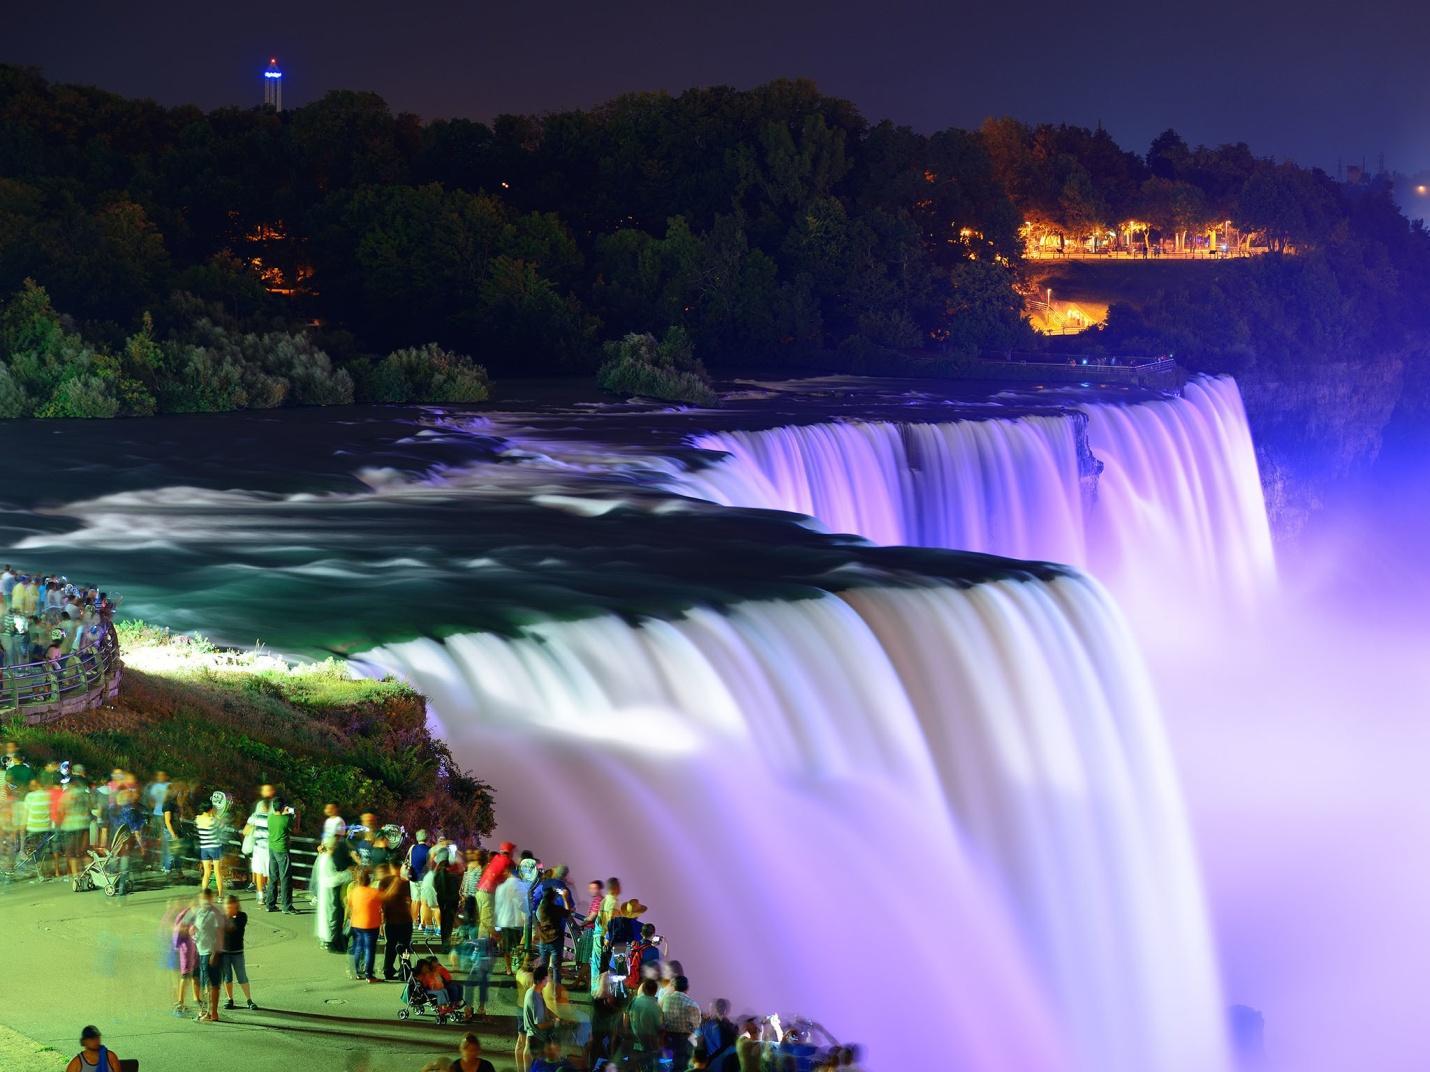 Niagara Falls, Canada, Ontario 2021 | Ultimate Guide To Where To Go, Eat &  Sleep in Niagara Falls, Canada | Time Out